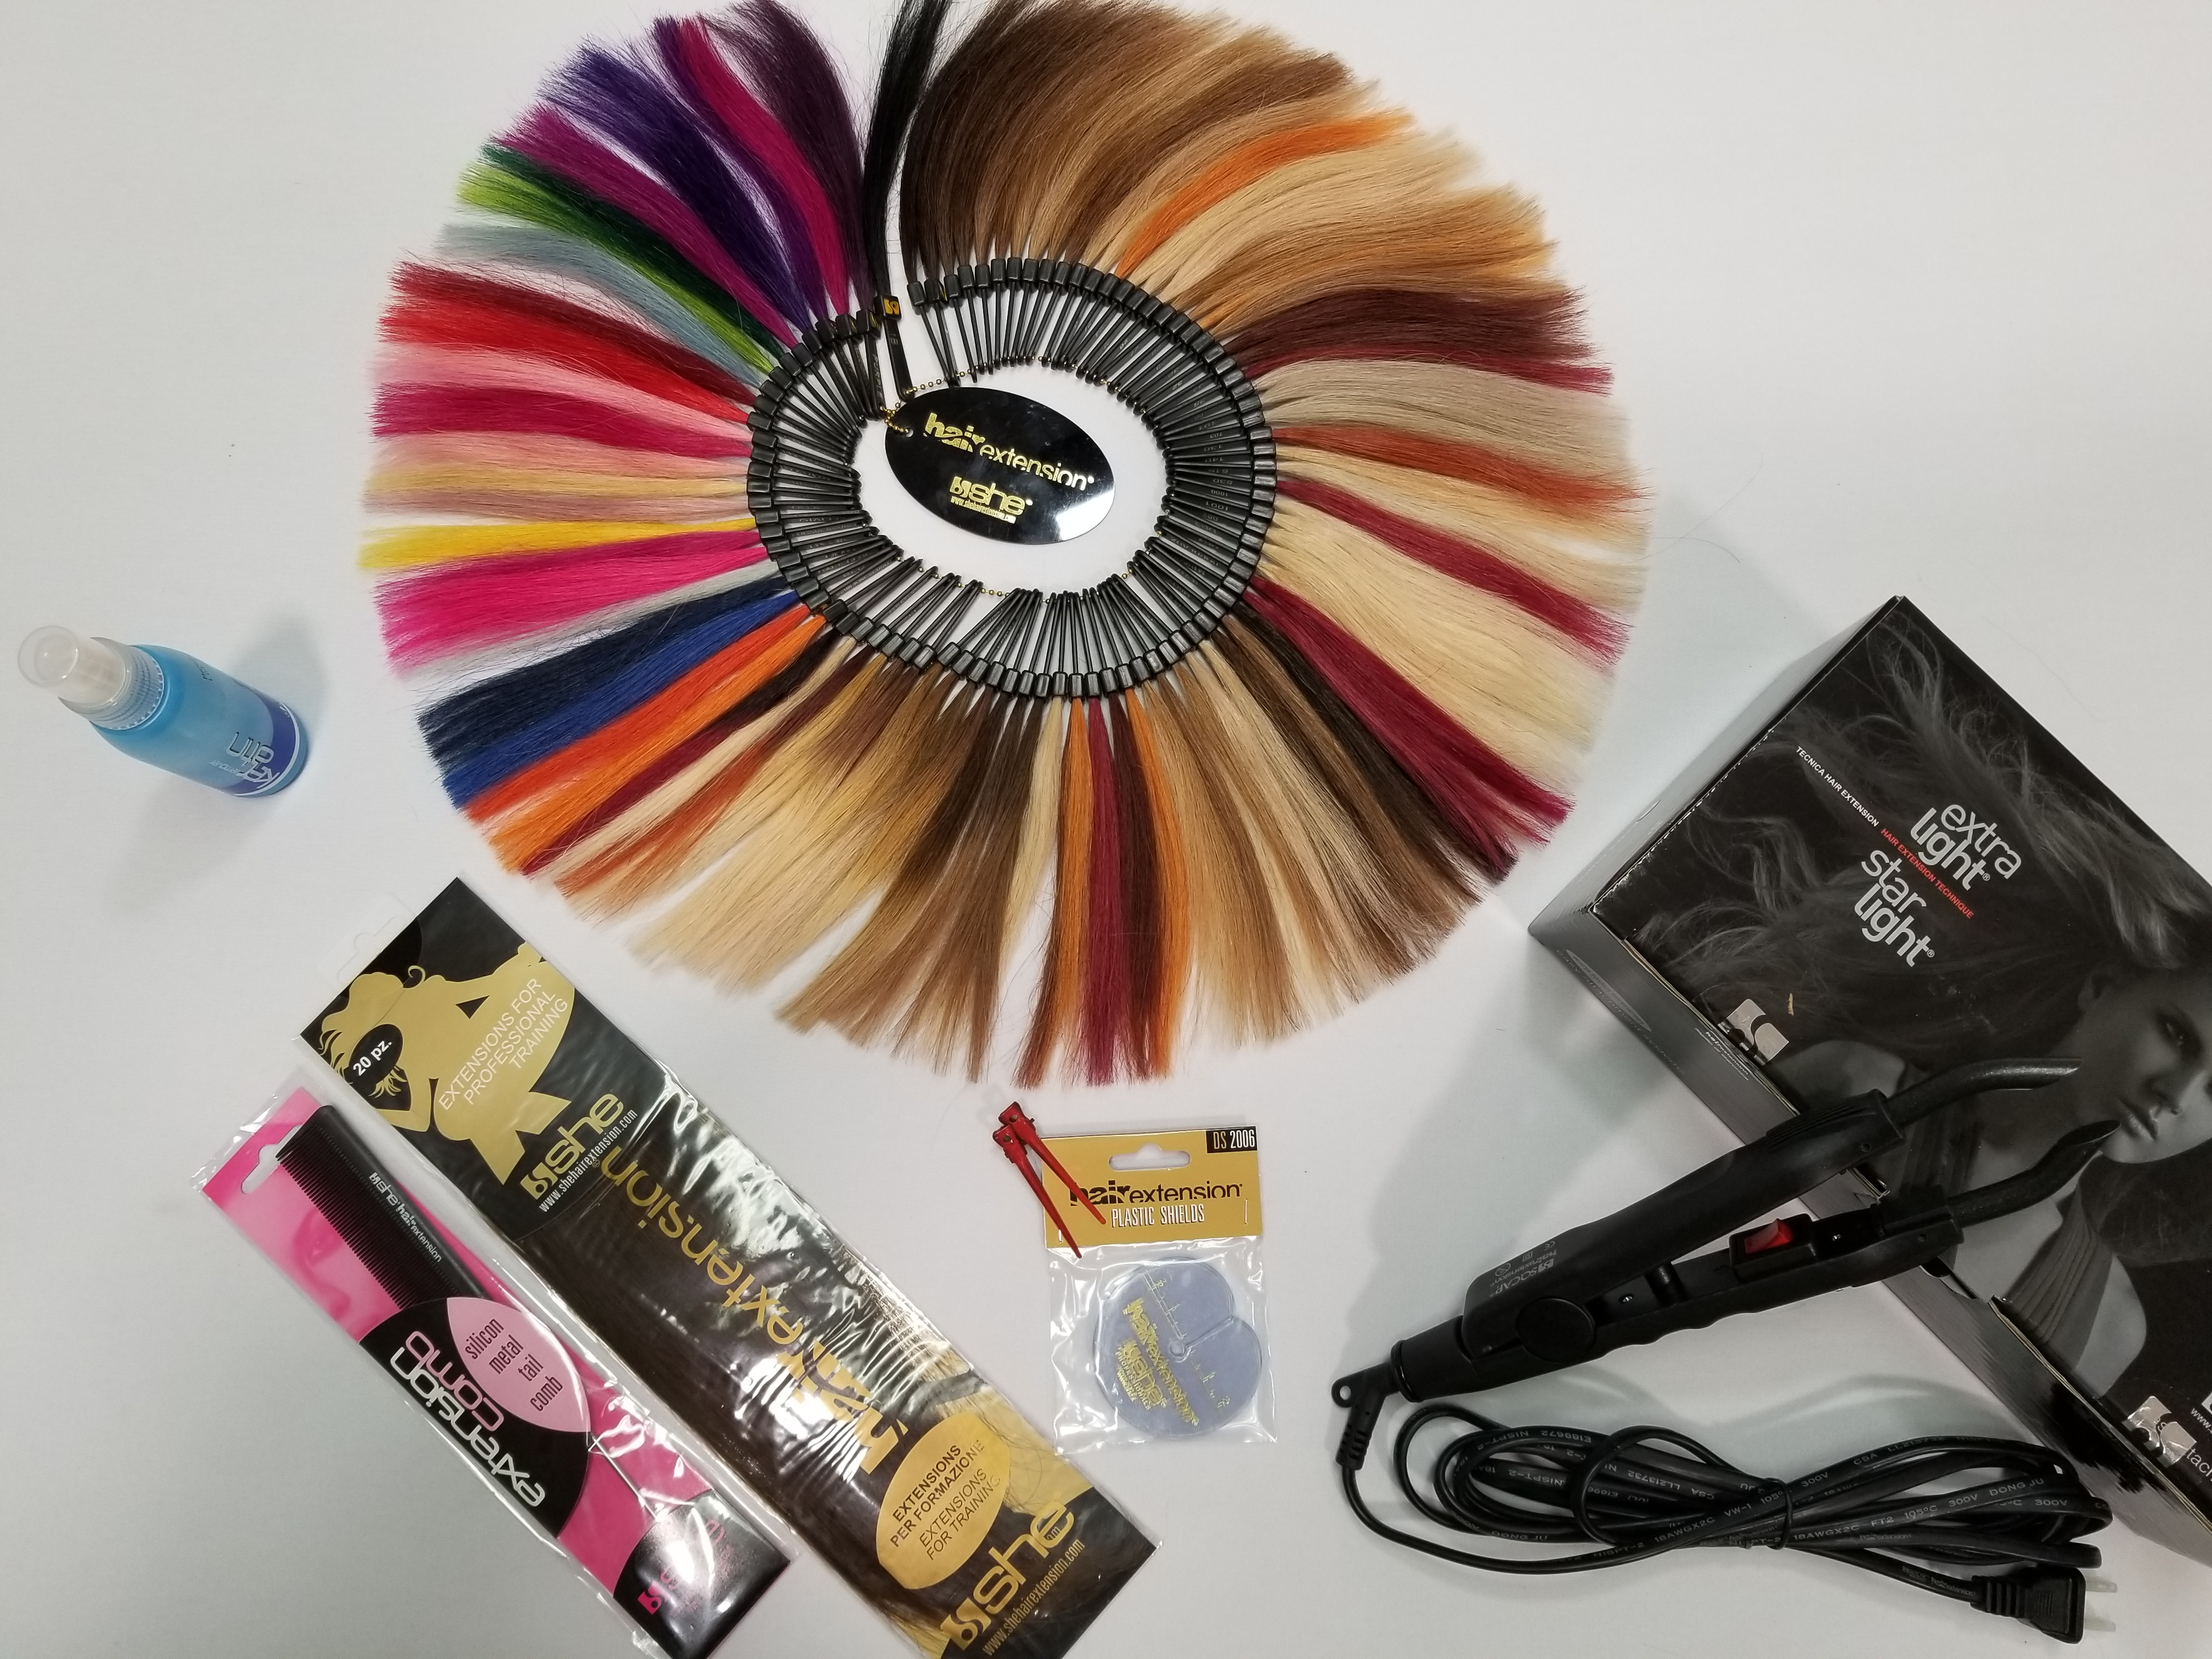 SHE Extra Light Kit $1224